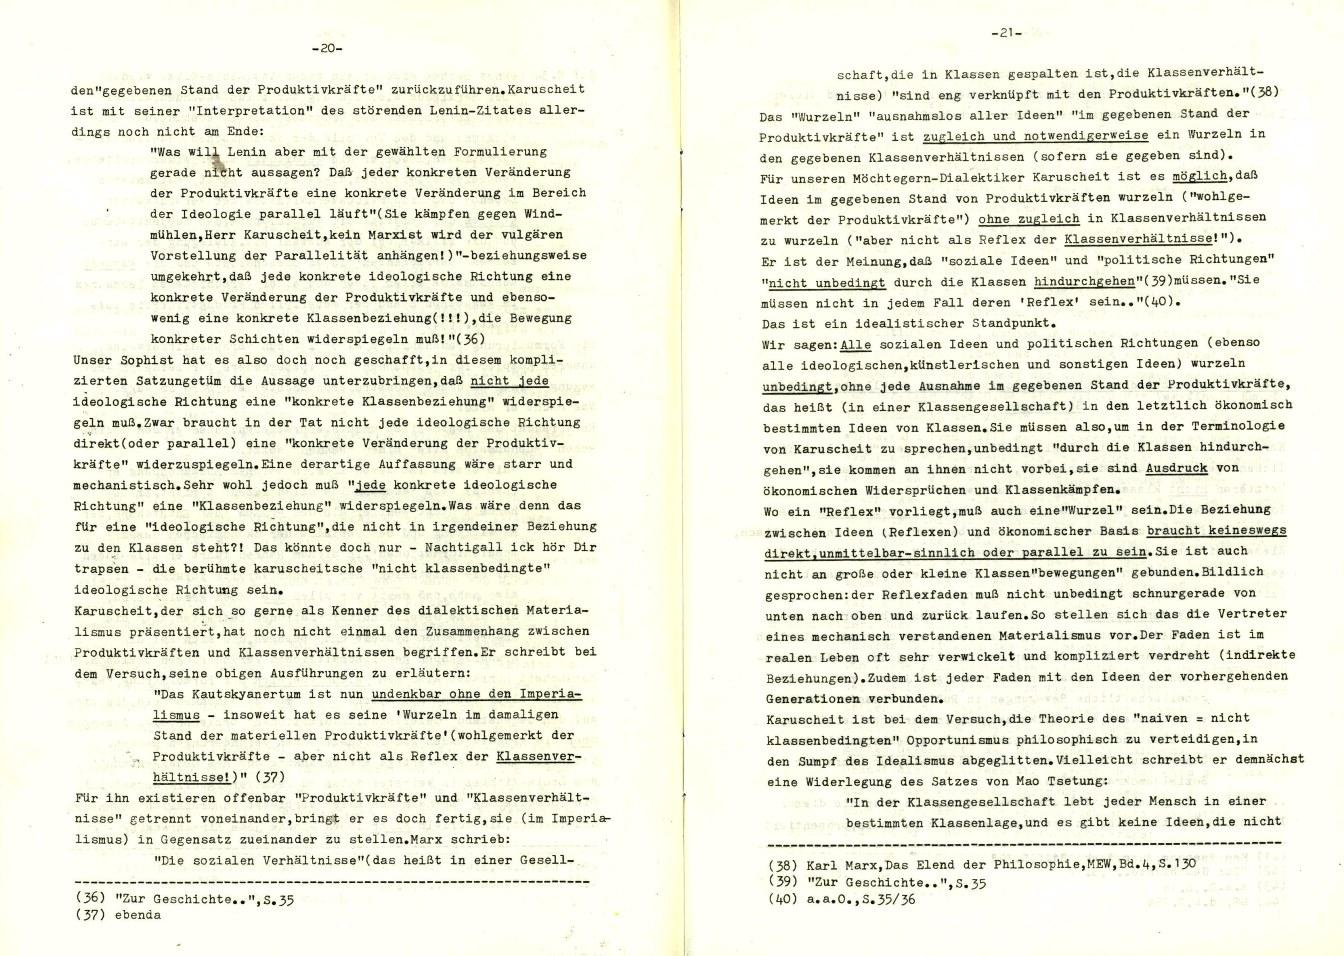 Muenchen_Kampf_dem_Revisionismus_1979_09_11